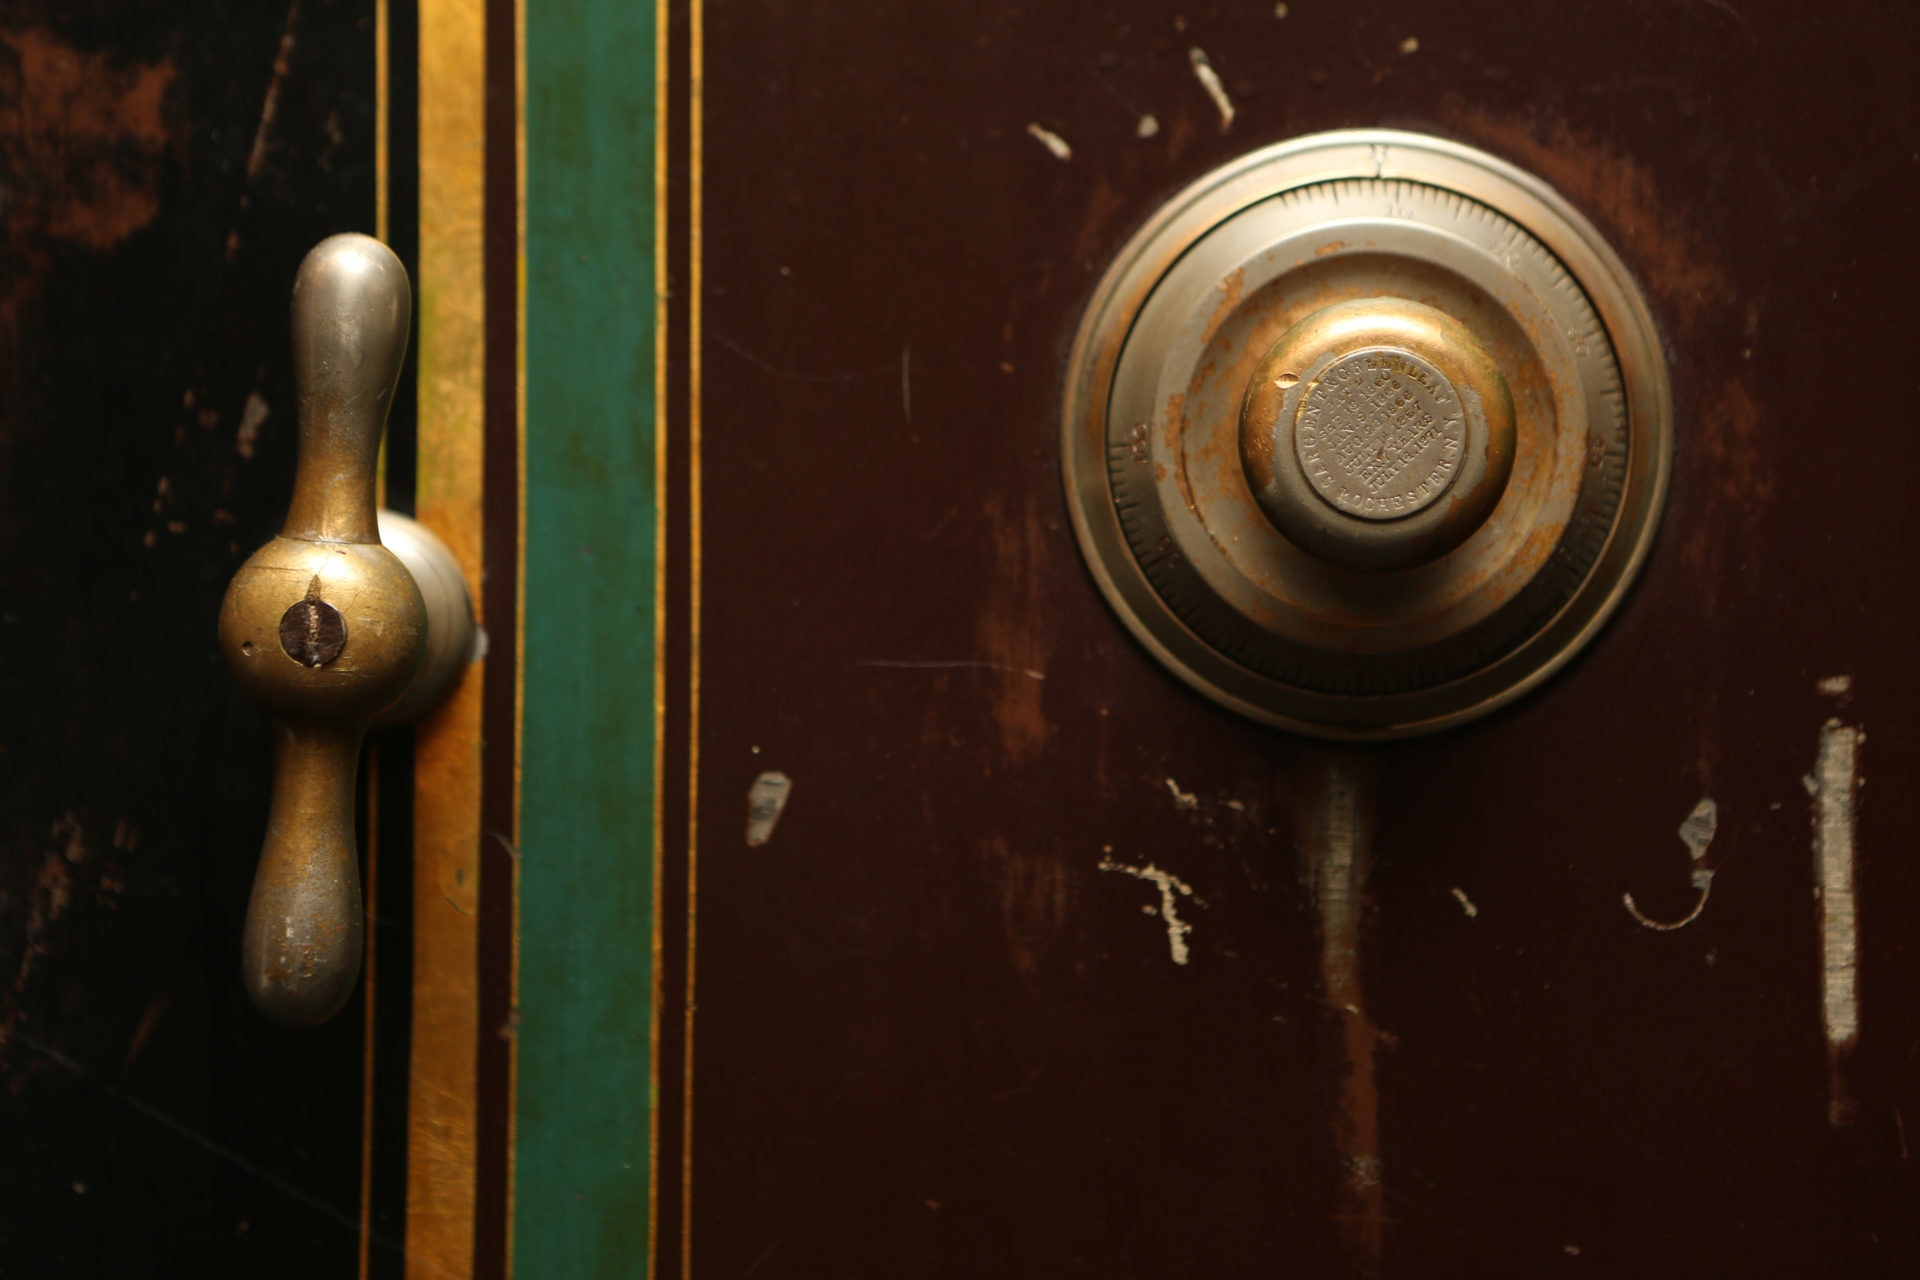 caja fuerte recurso seguridad protección de datos safe strongbox